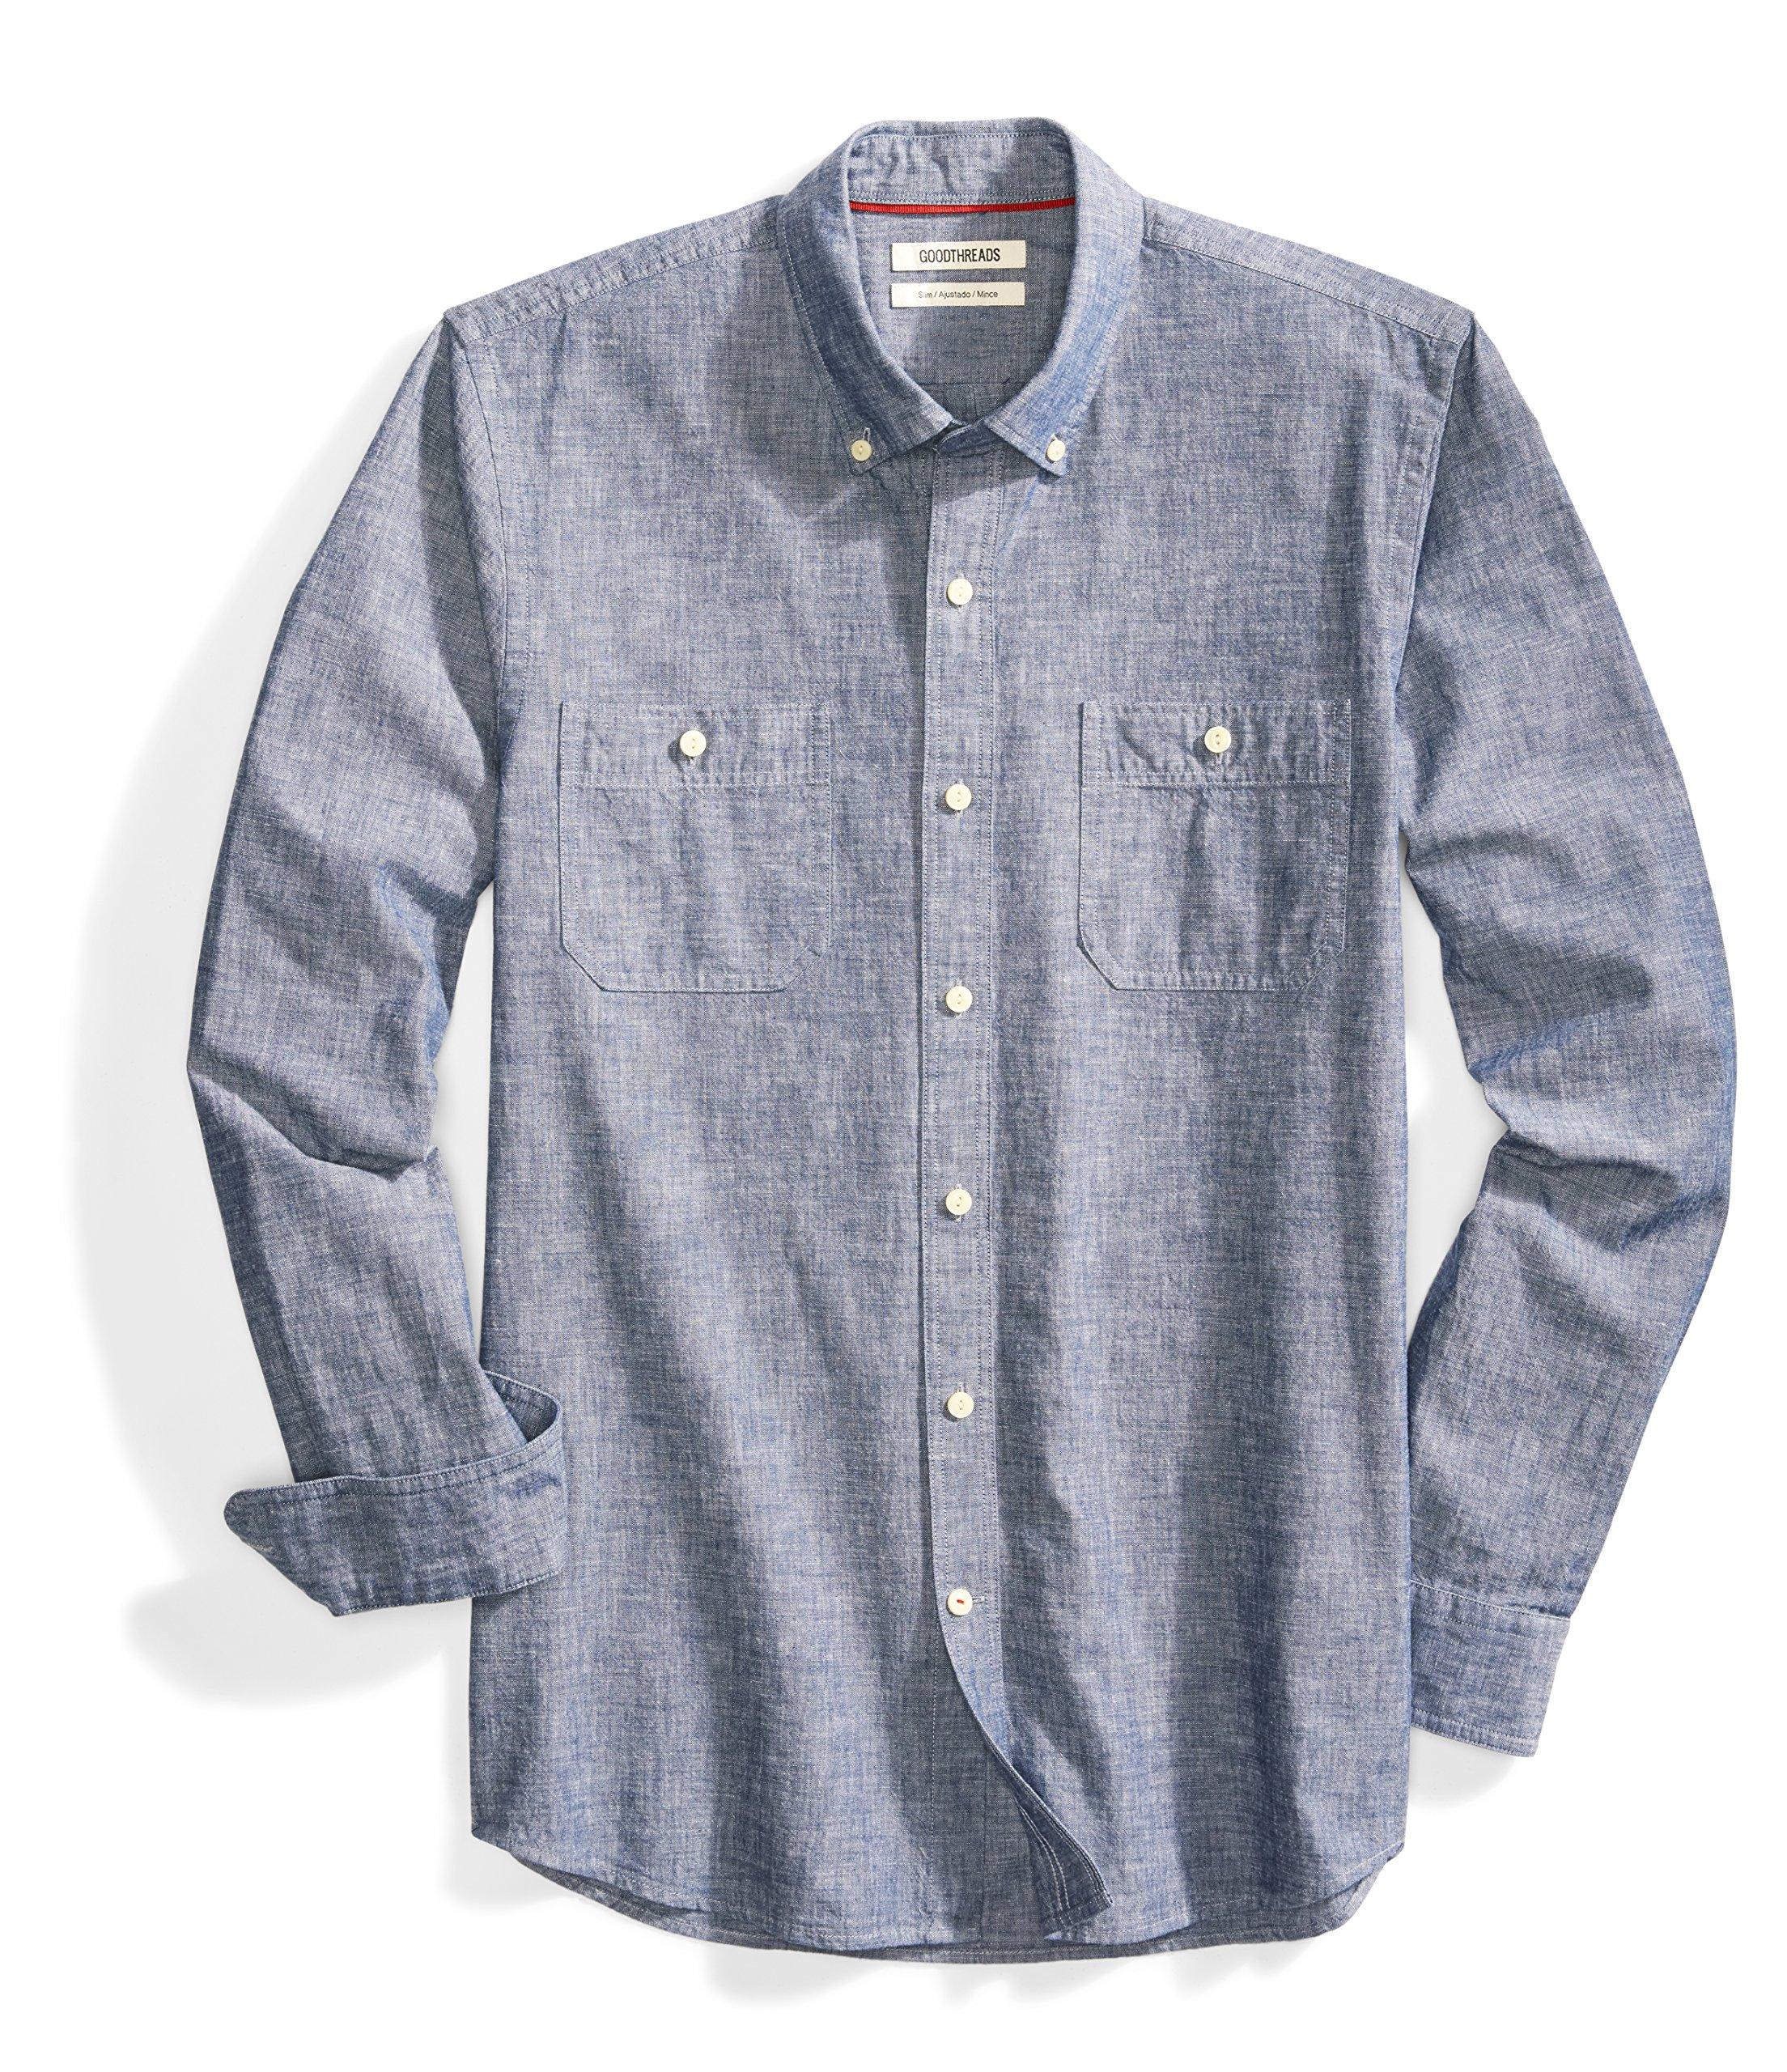 Goodthreads Men's Slim-Fit Long-Sleeve Chambray Shirt, Navy, Medium